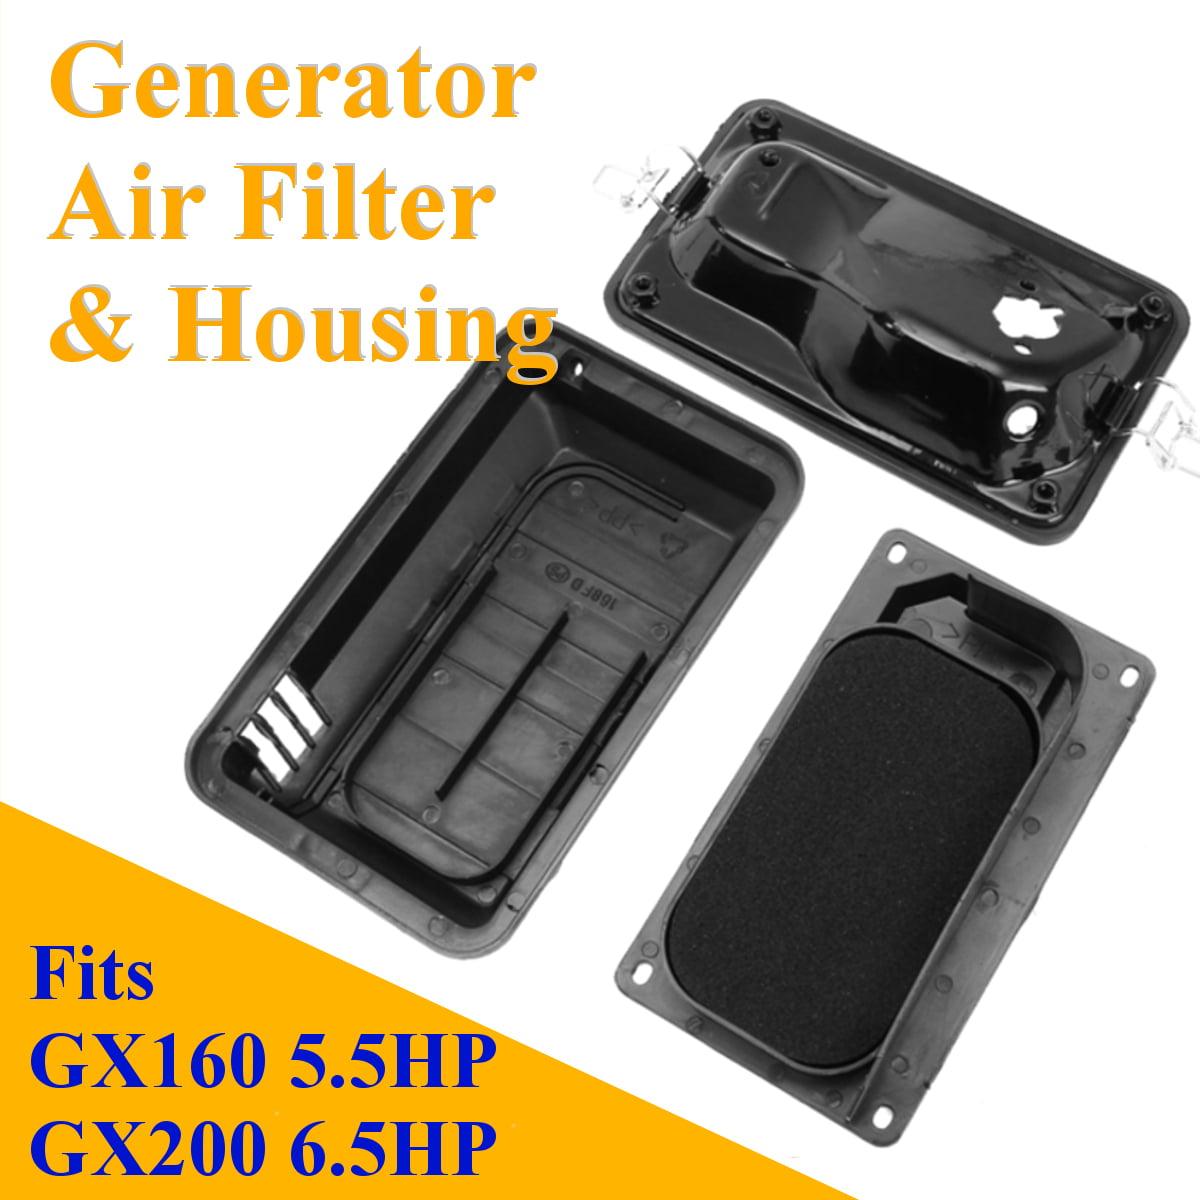 New Generator Air Filter Housing For Honda GX160 5.5HP GX200 6.5HP 17211-ZB2-000